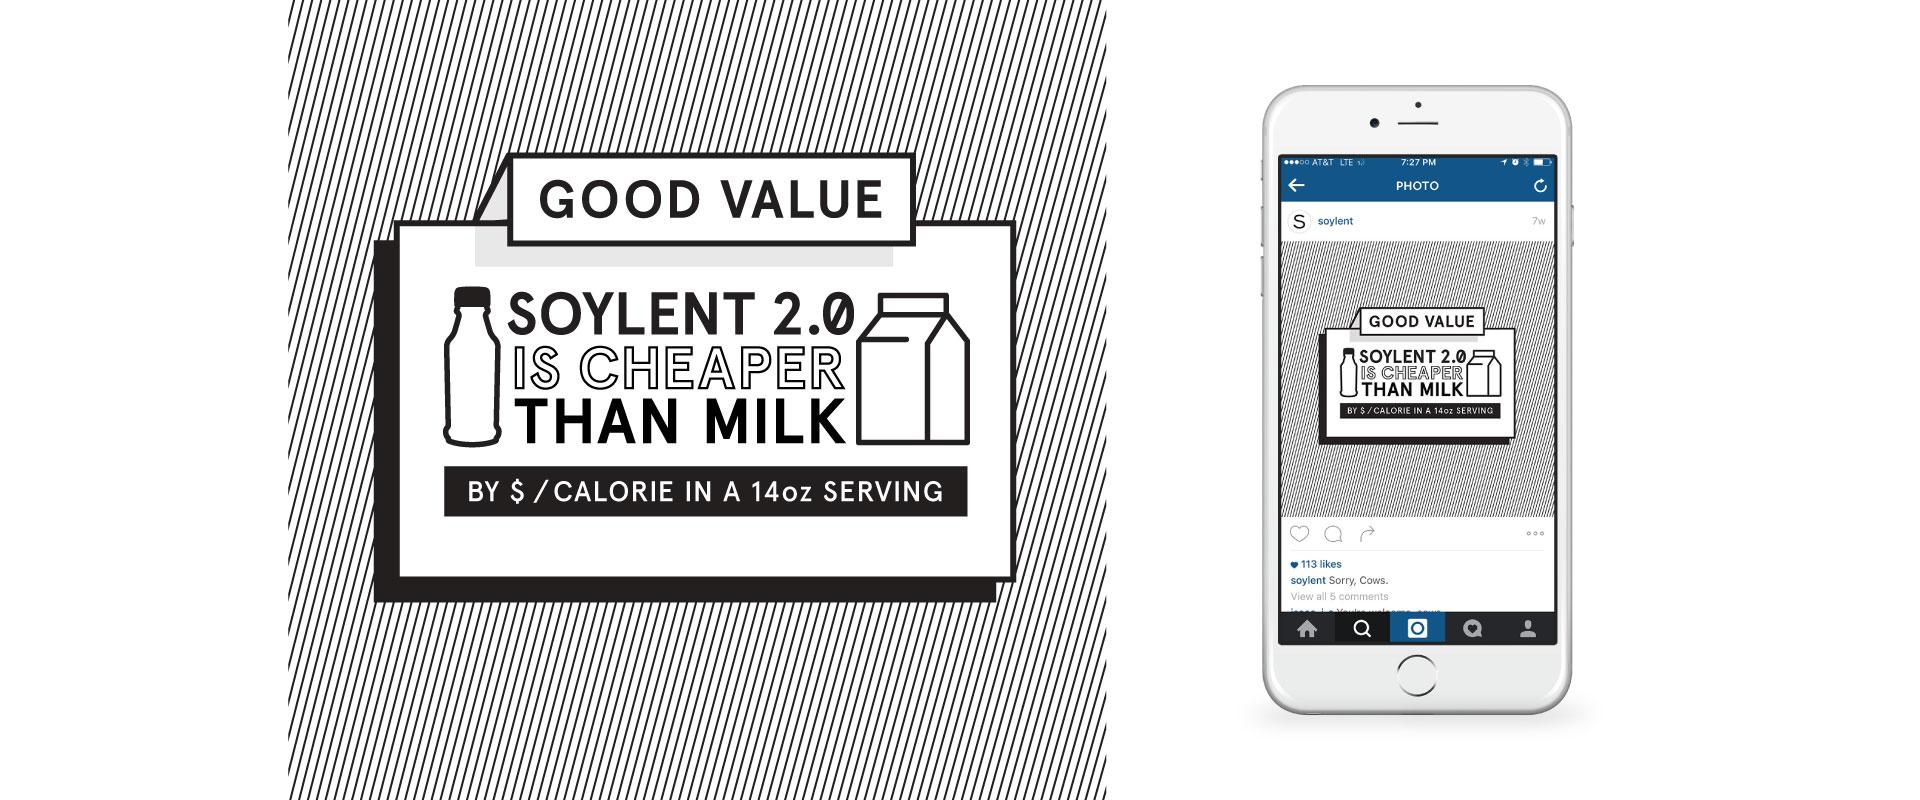 soylent_infographic_milk.jpg